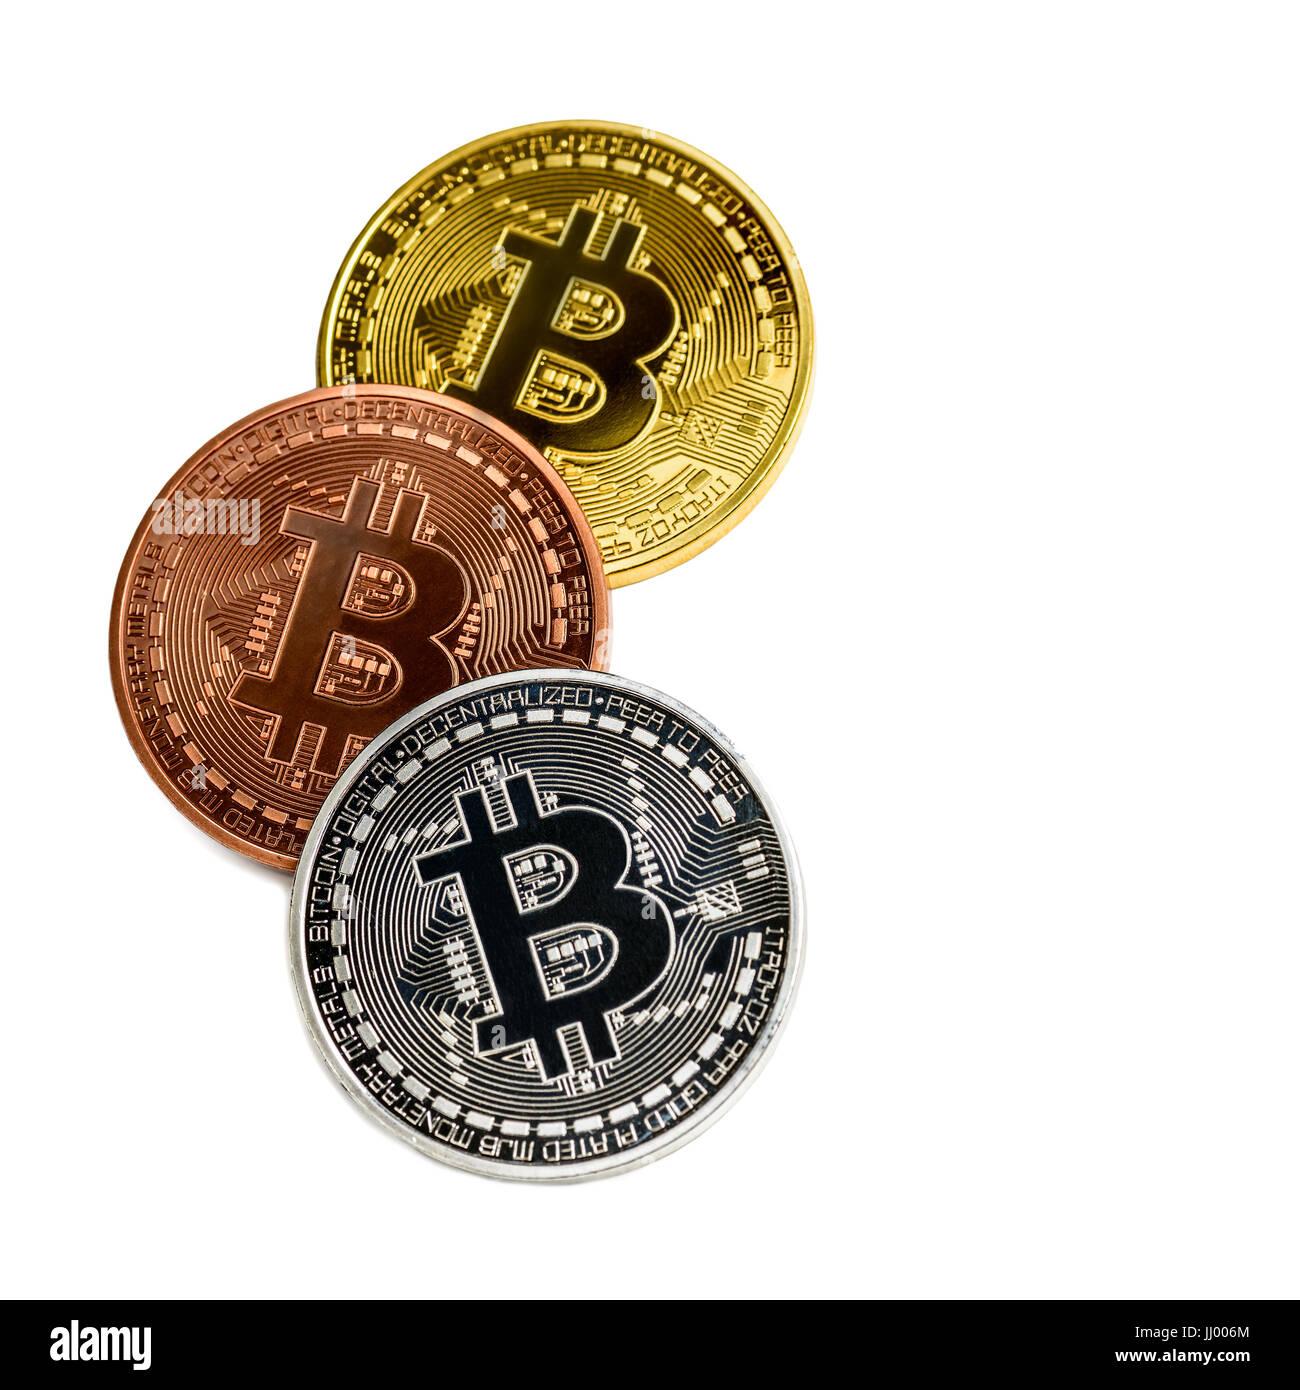 Bitcoin MГјnzen